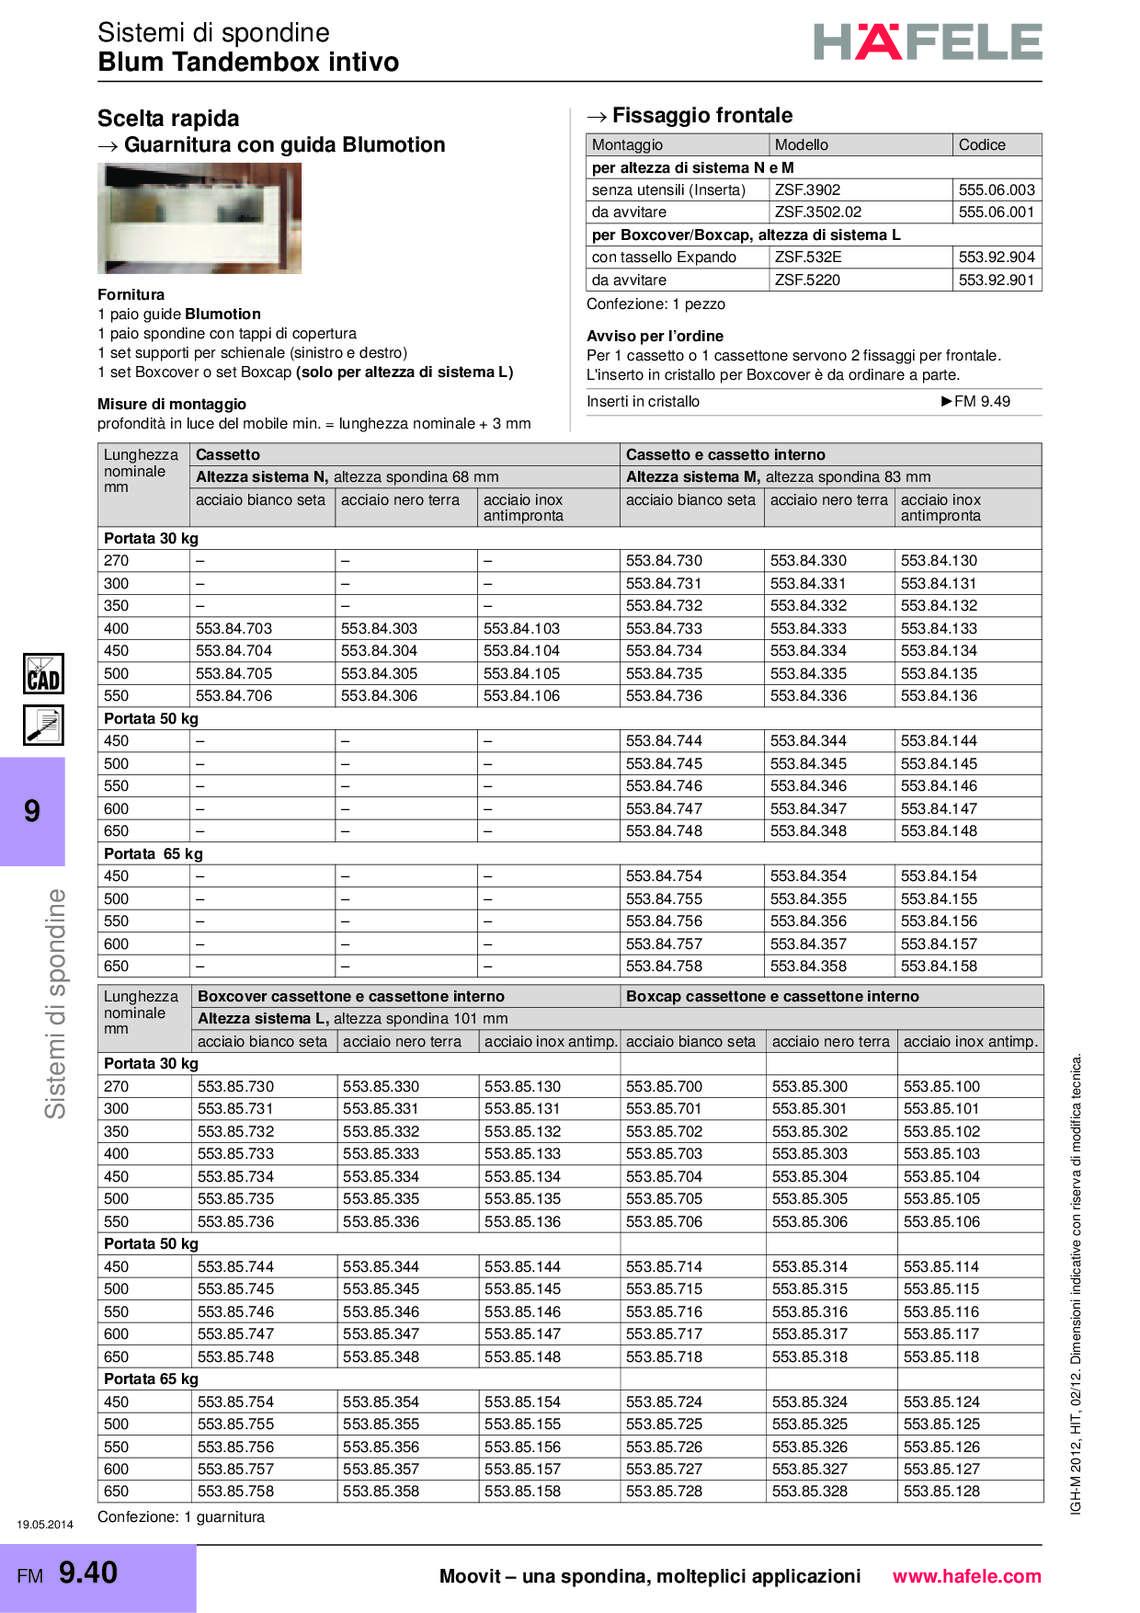 hafele-spondine-e-guide-per-mobili_40_053.jpg